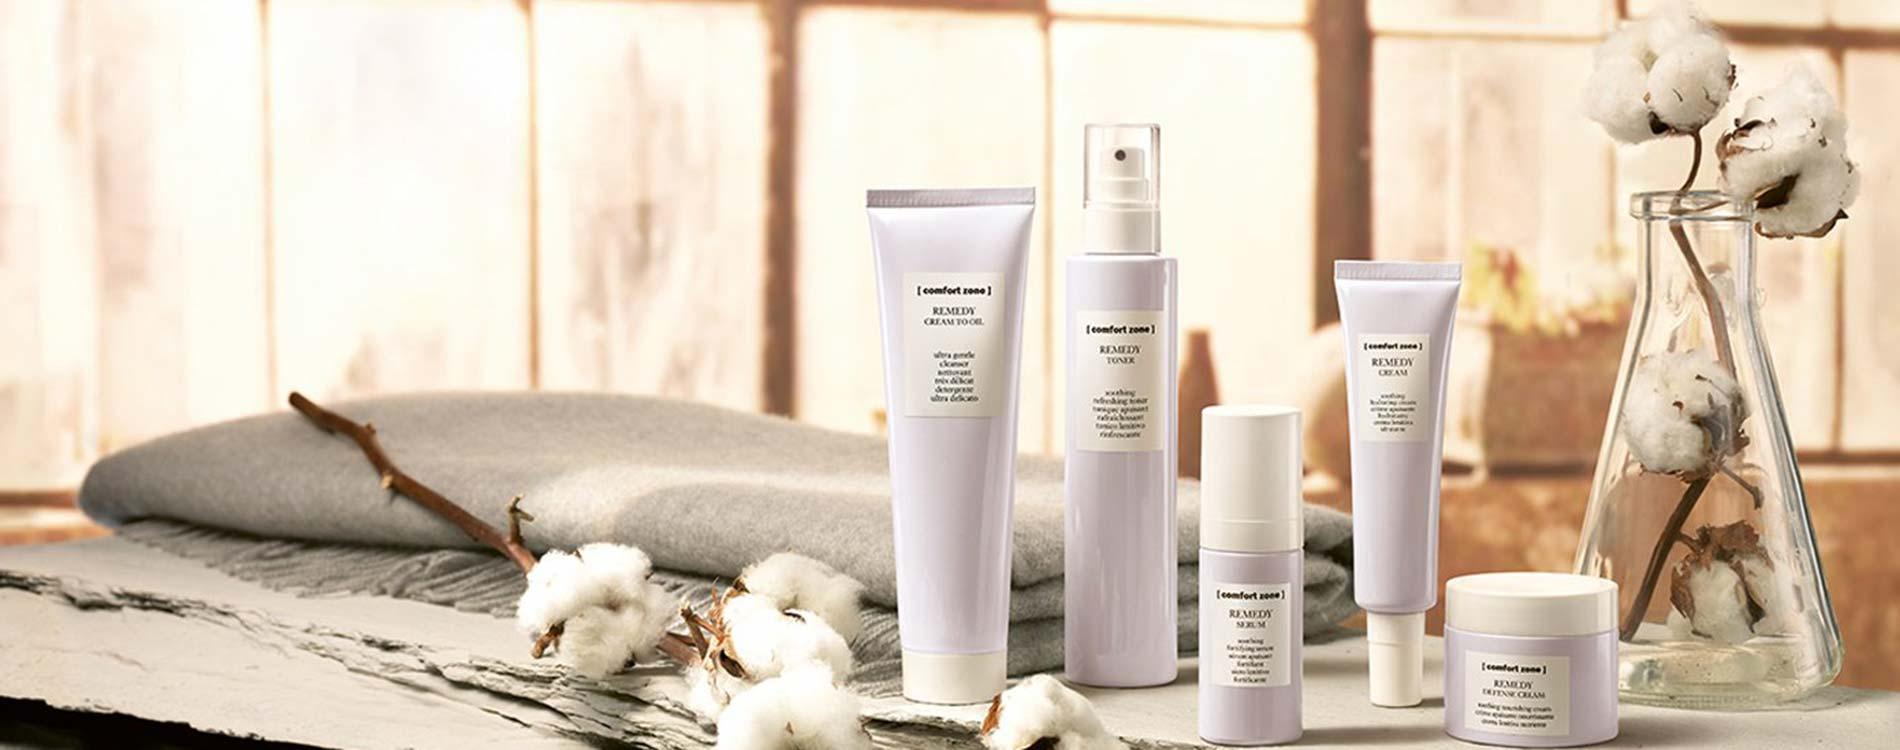 Shop comfort zone pure Altitude PROSPA Kosmetik Imst Kosmetikstudio Oberland